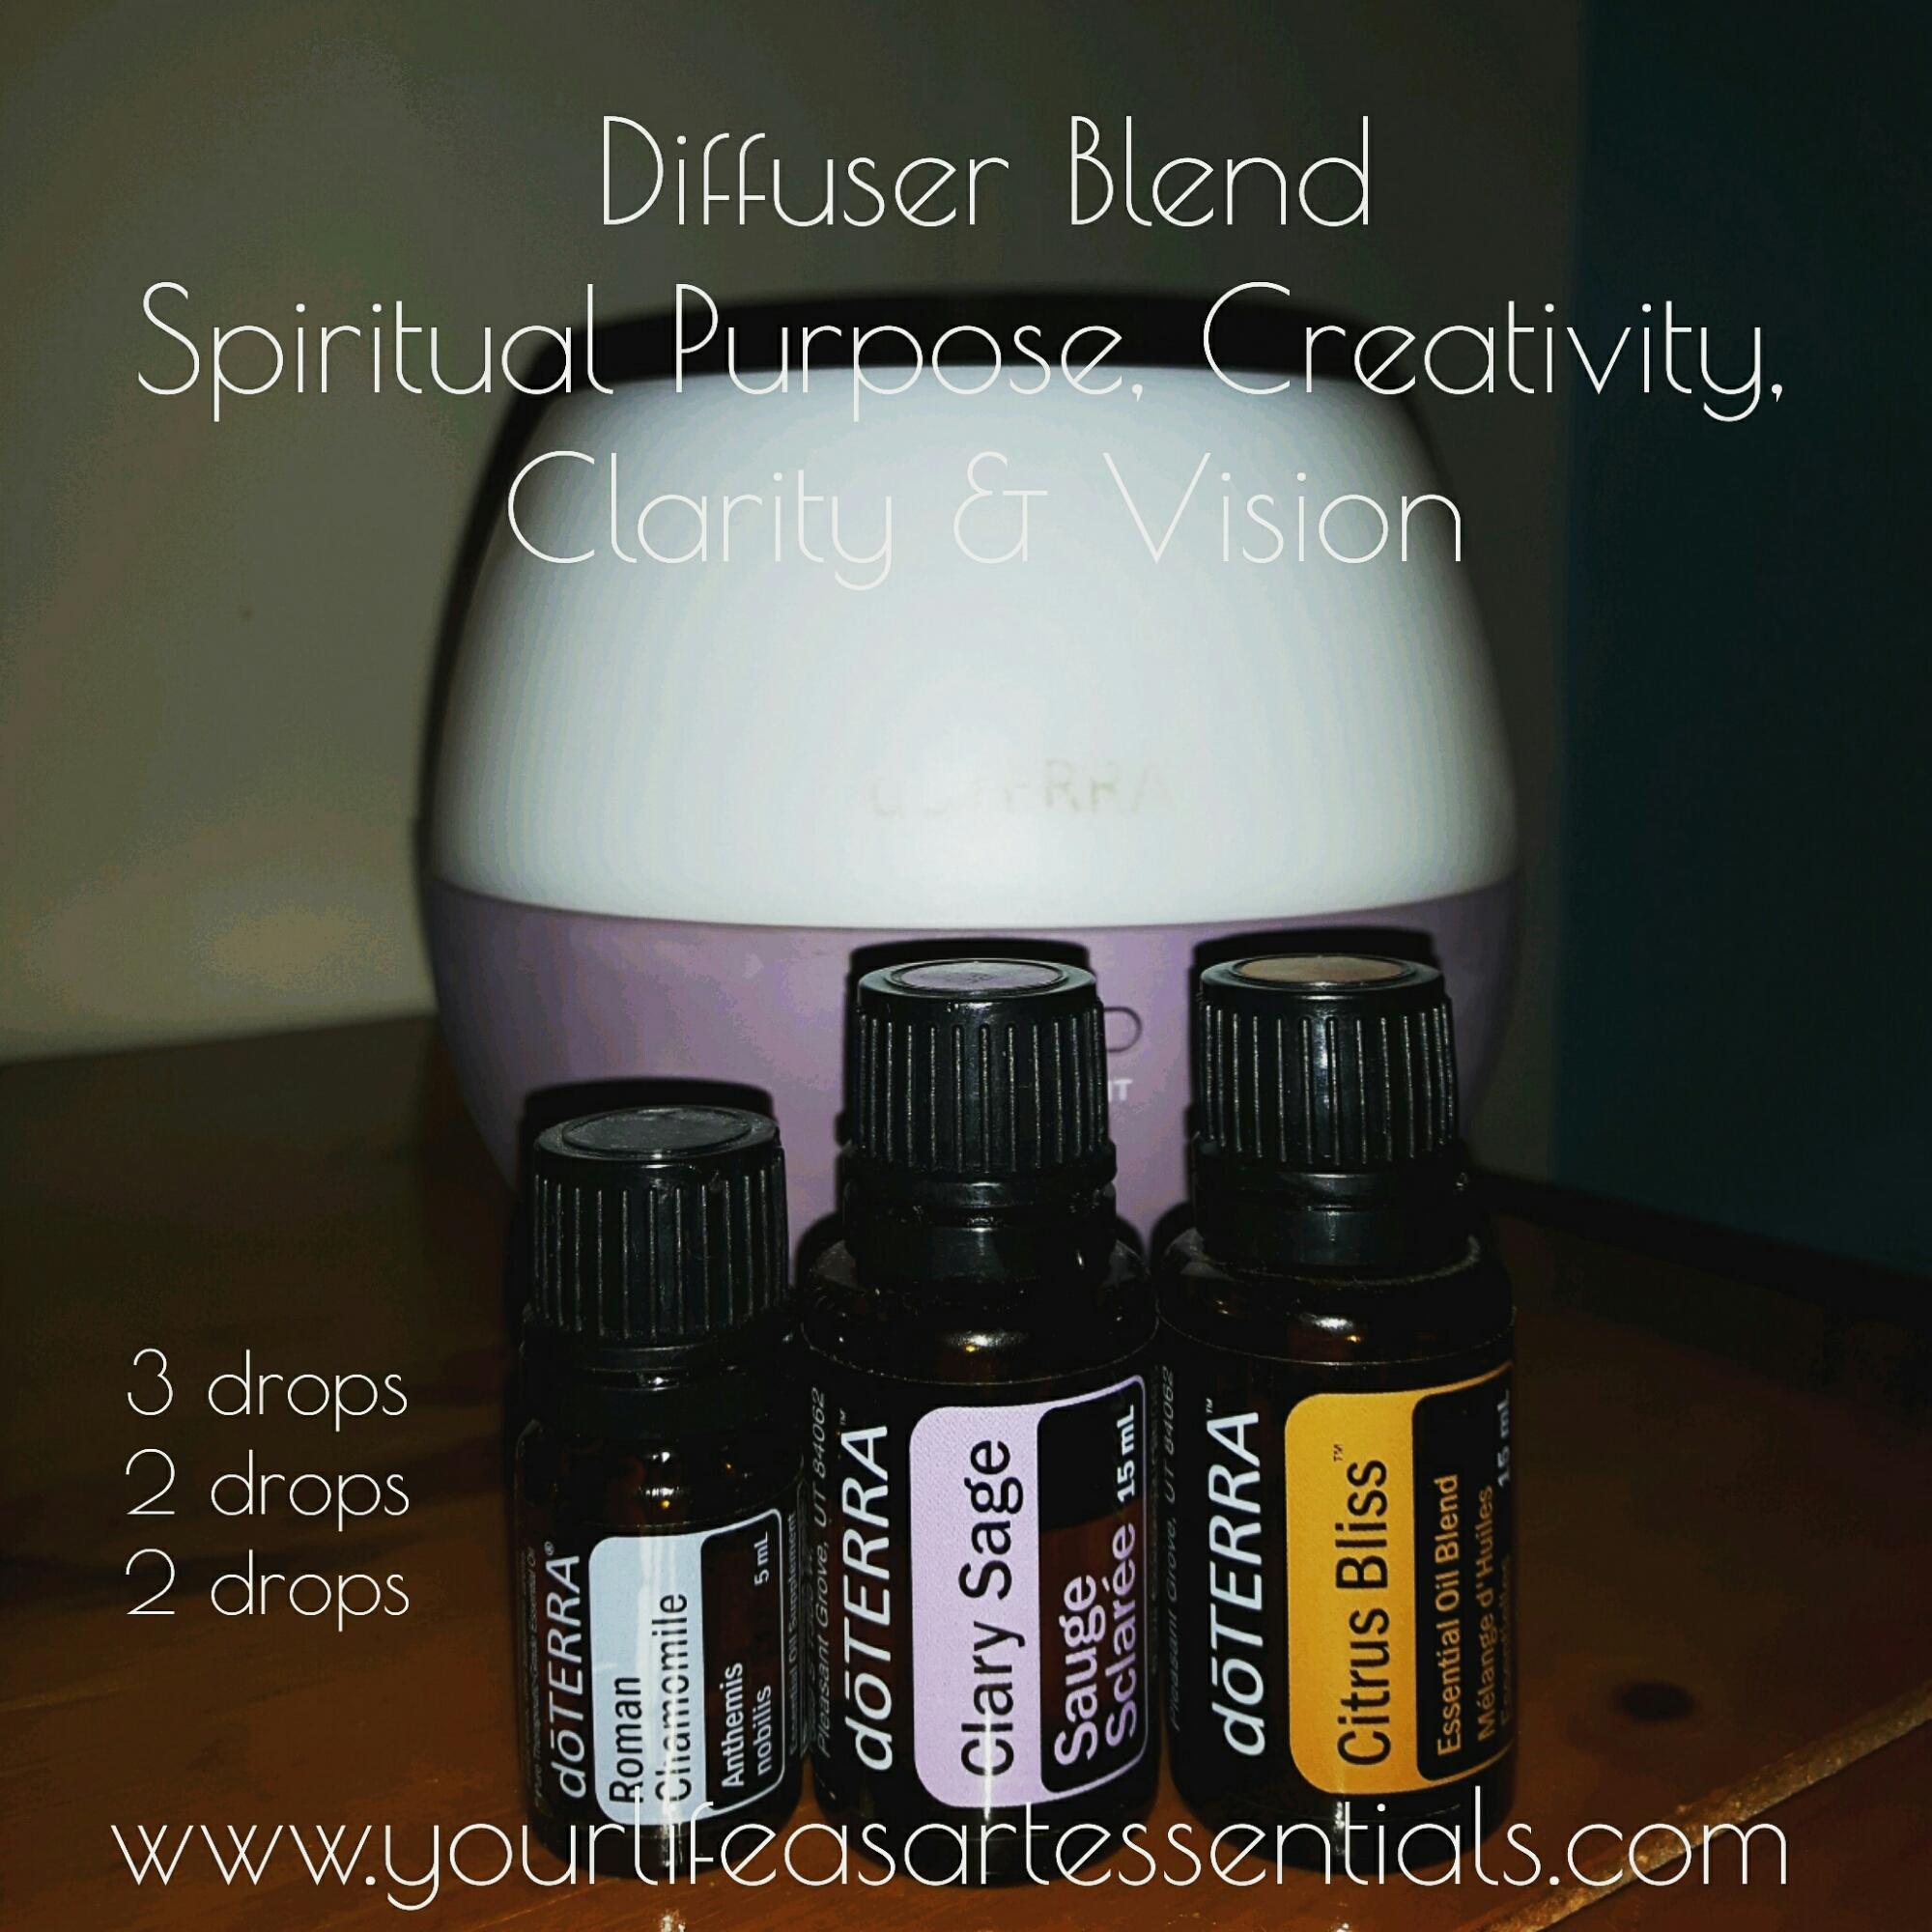 Spiritual Purpose, Creativity, Clarity & Vision | Diffuser